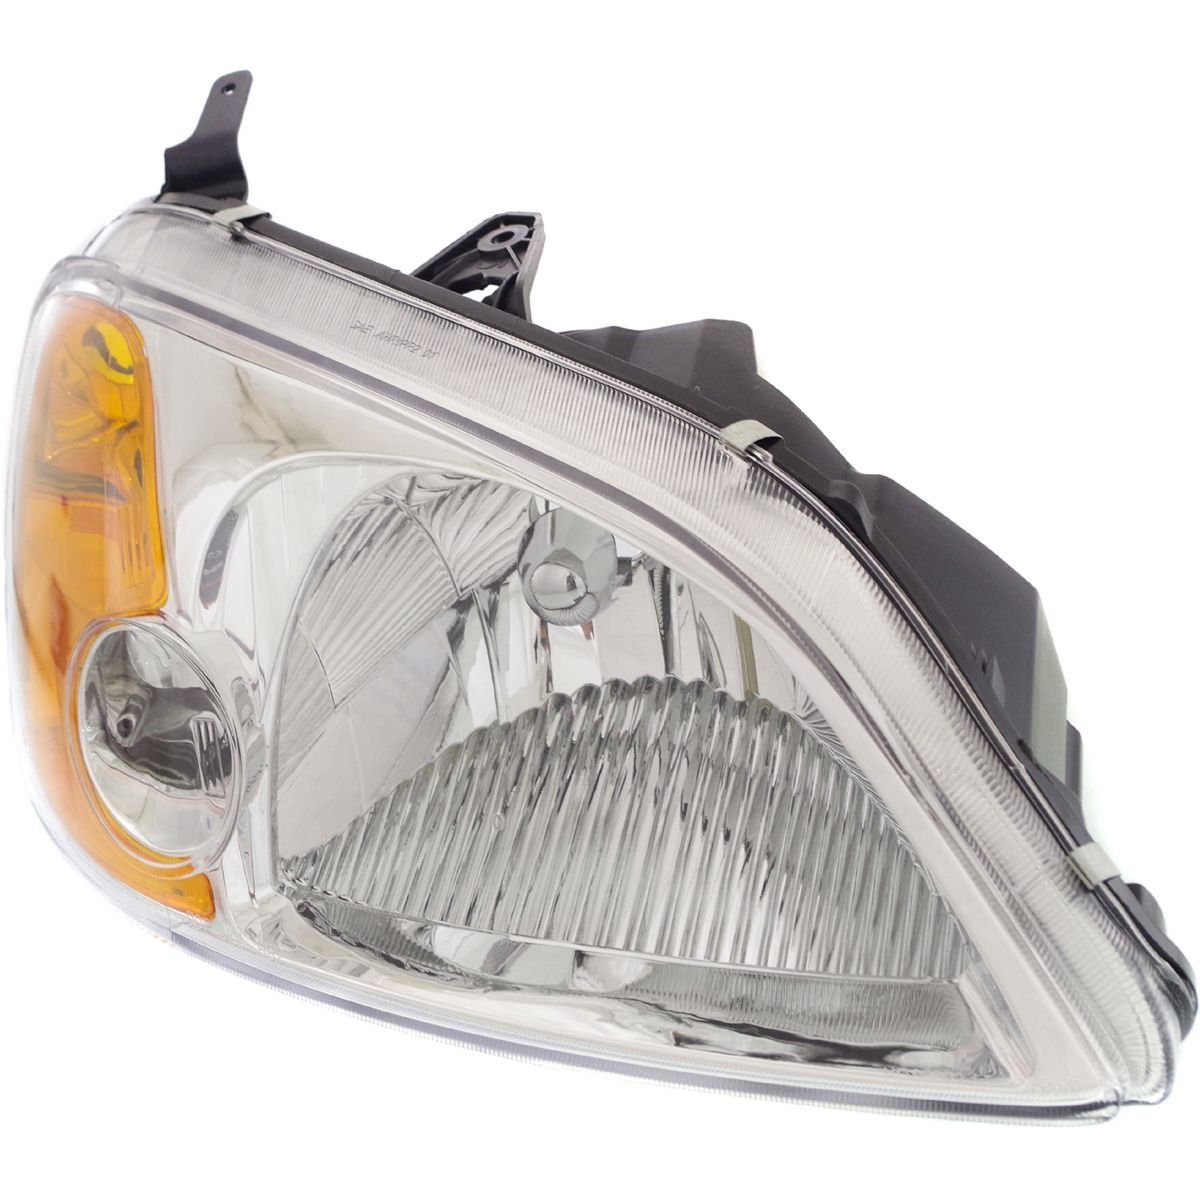 Genuine Honda Parts 33101-S01-A02 Passenger Side Headlight Assembly Composite